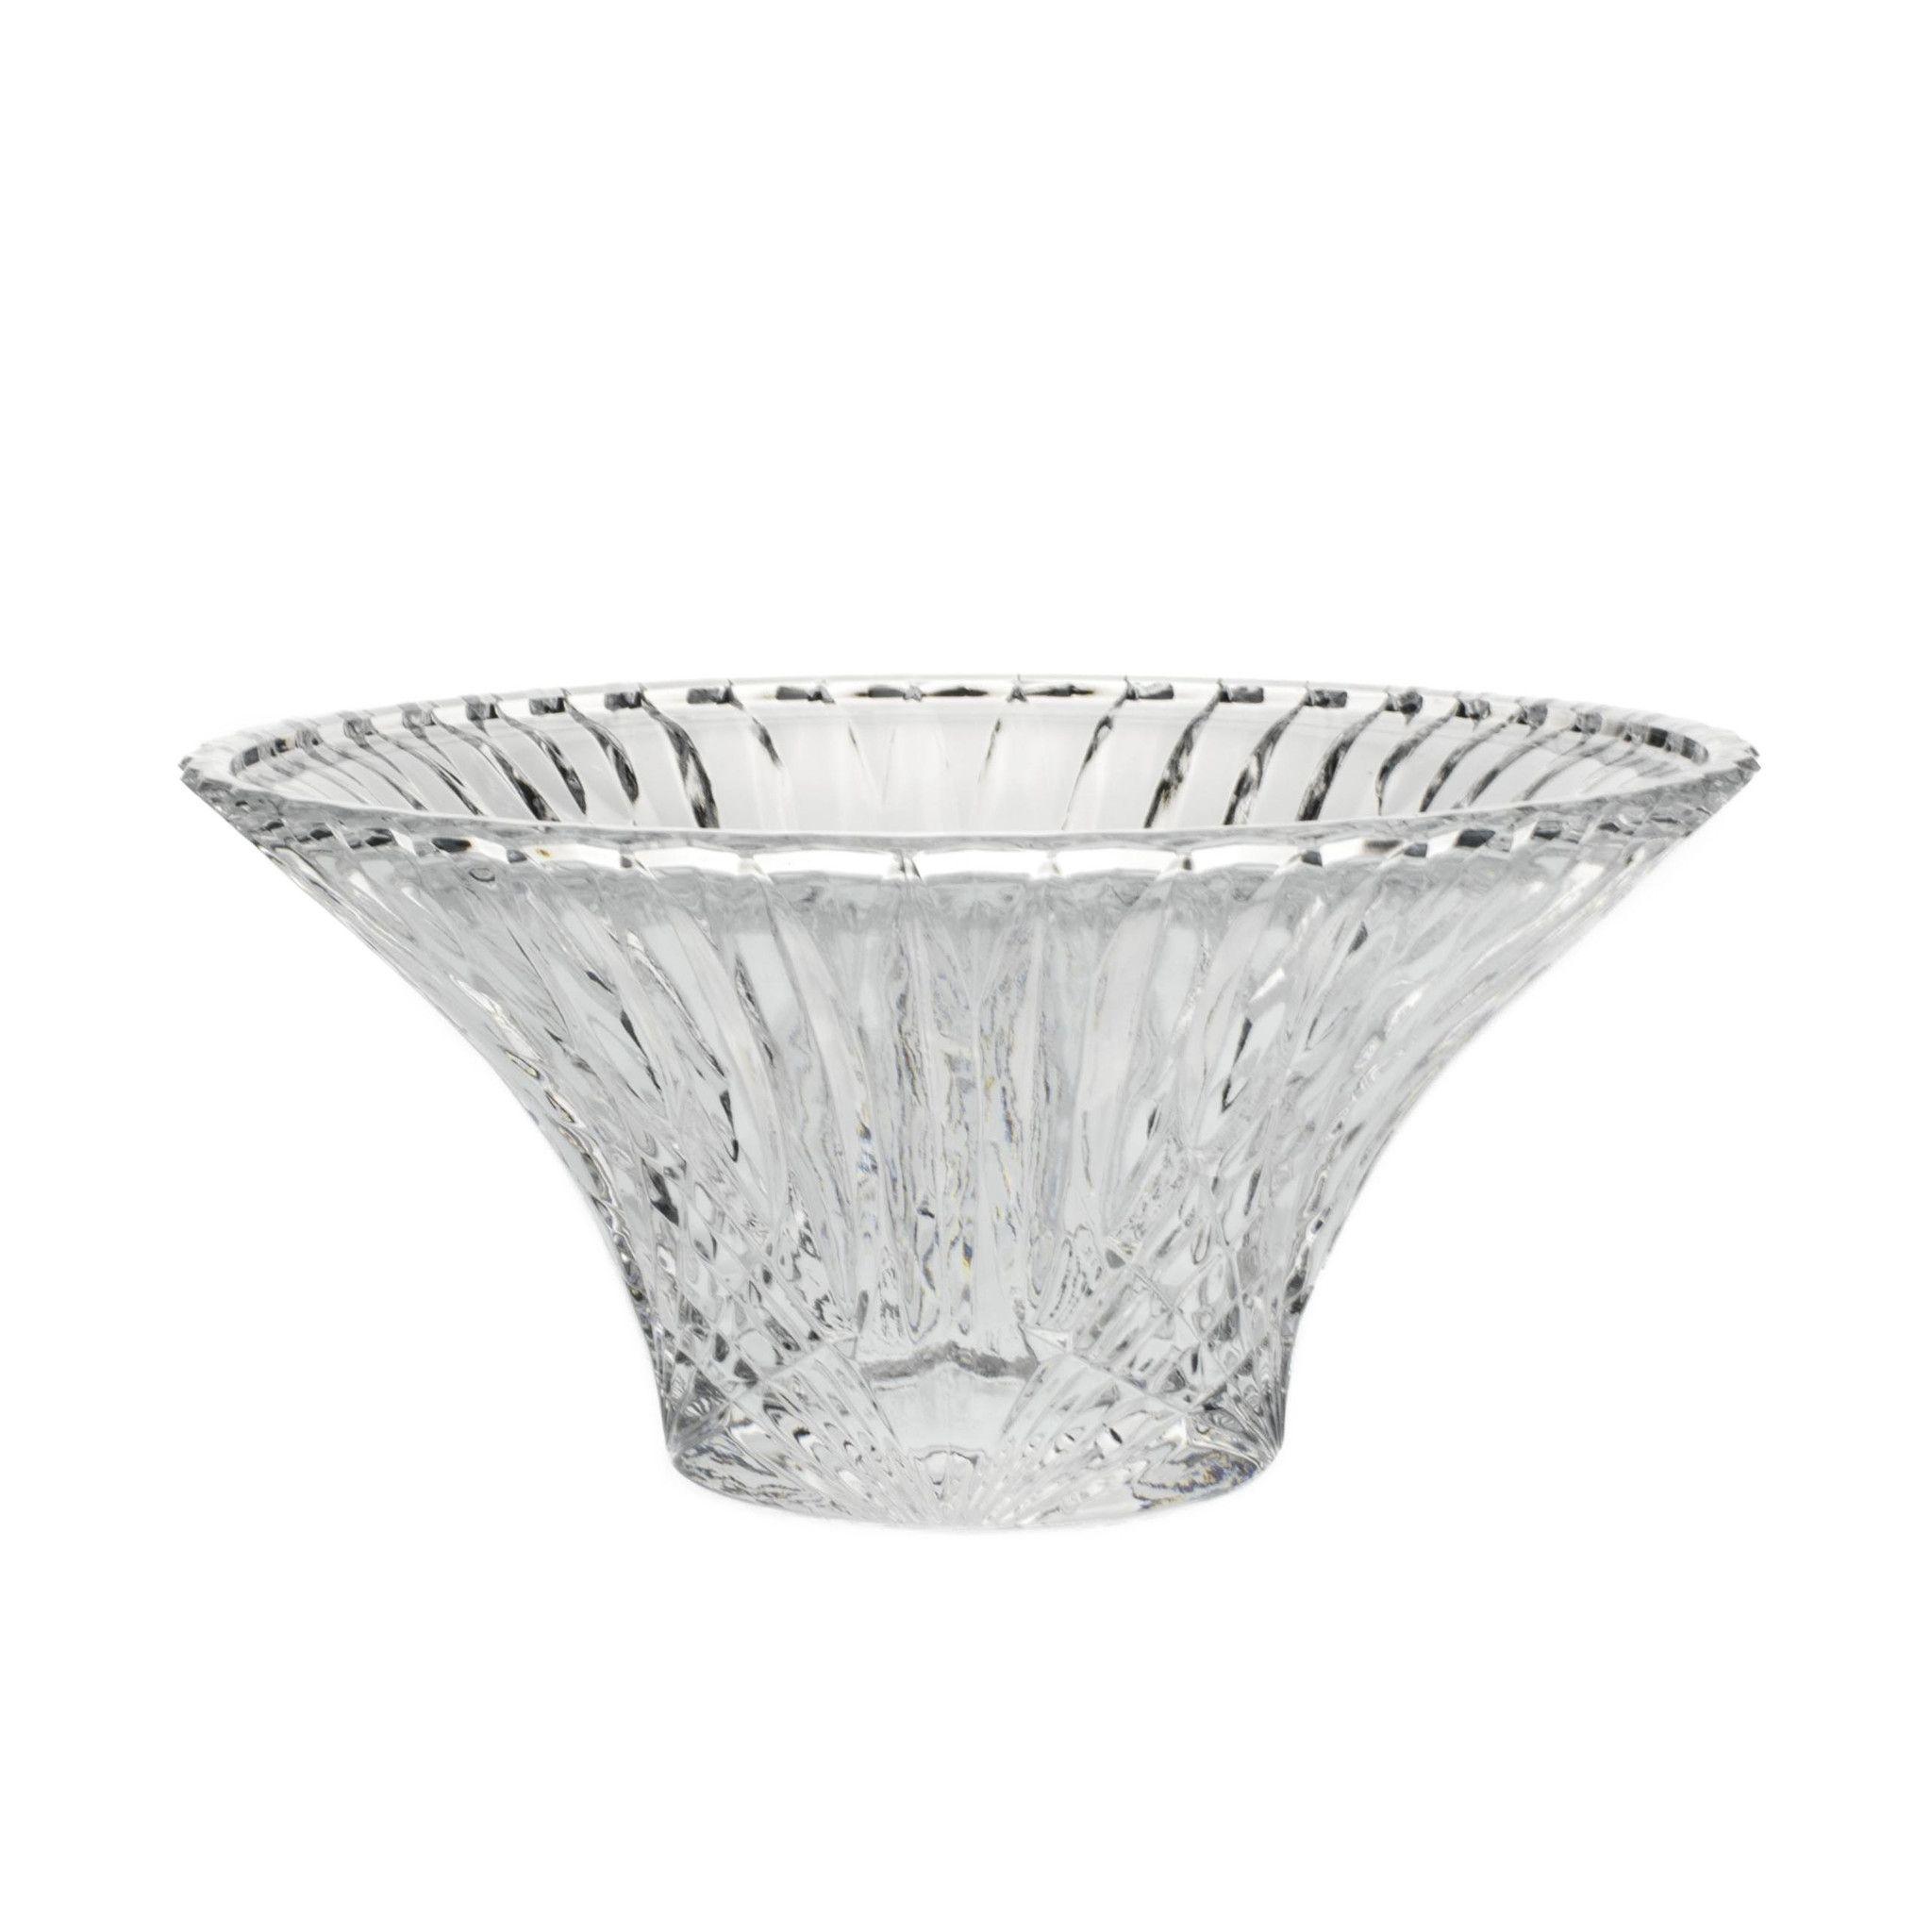 Crystal Fruit Bowl